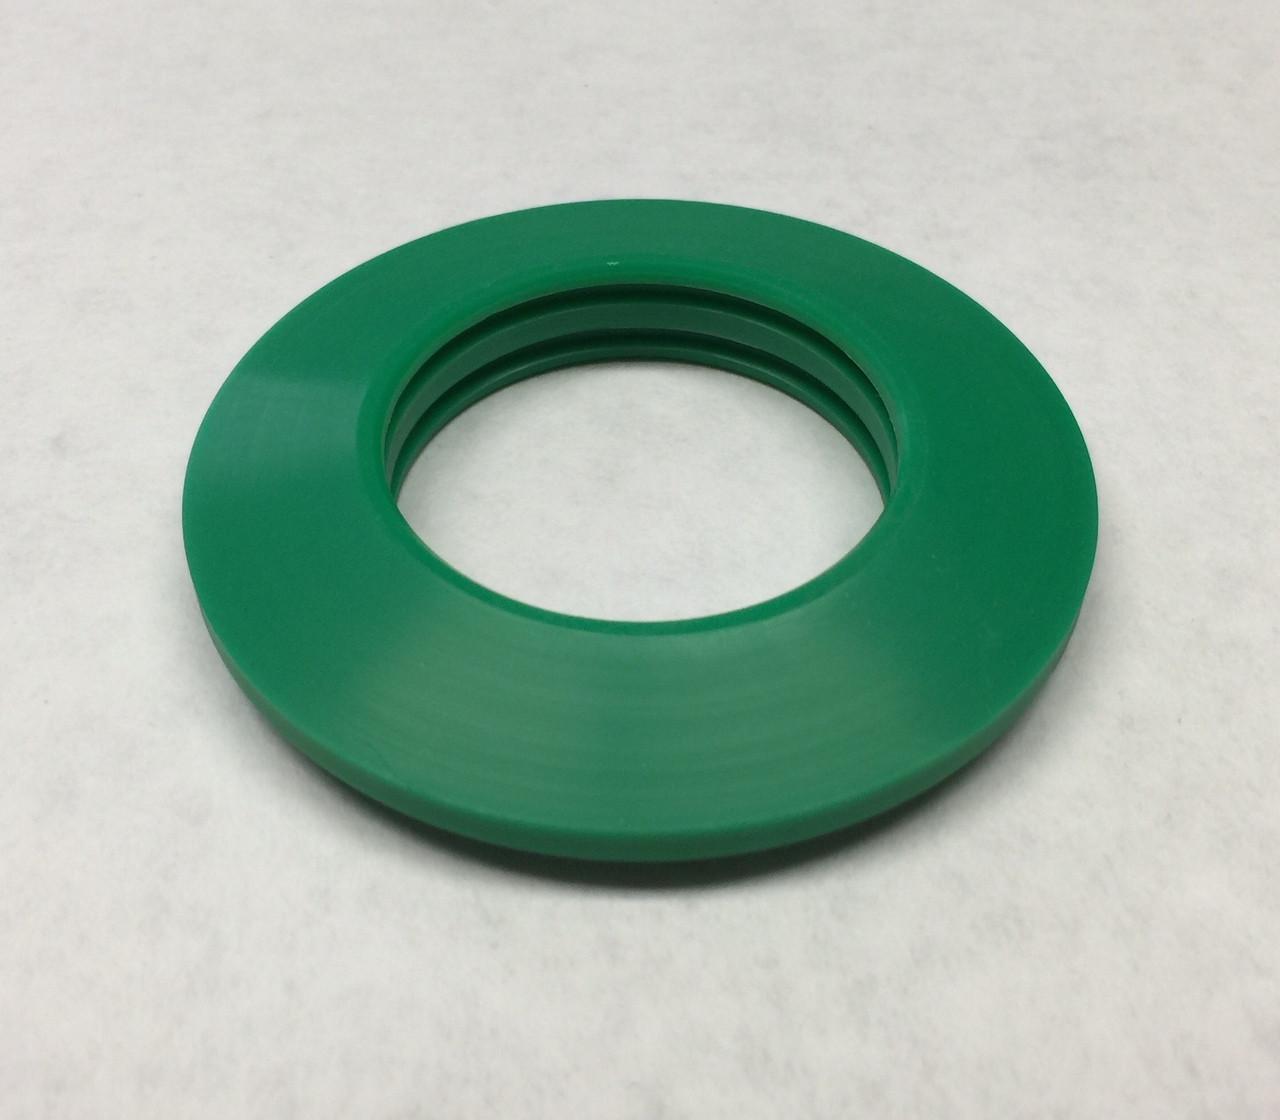 Talsa K-641 - K30e & K30v - Seperator Ring, Green Plastic - 7368